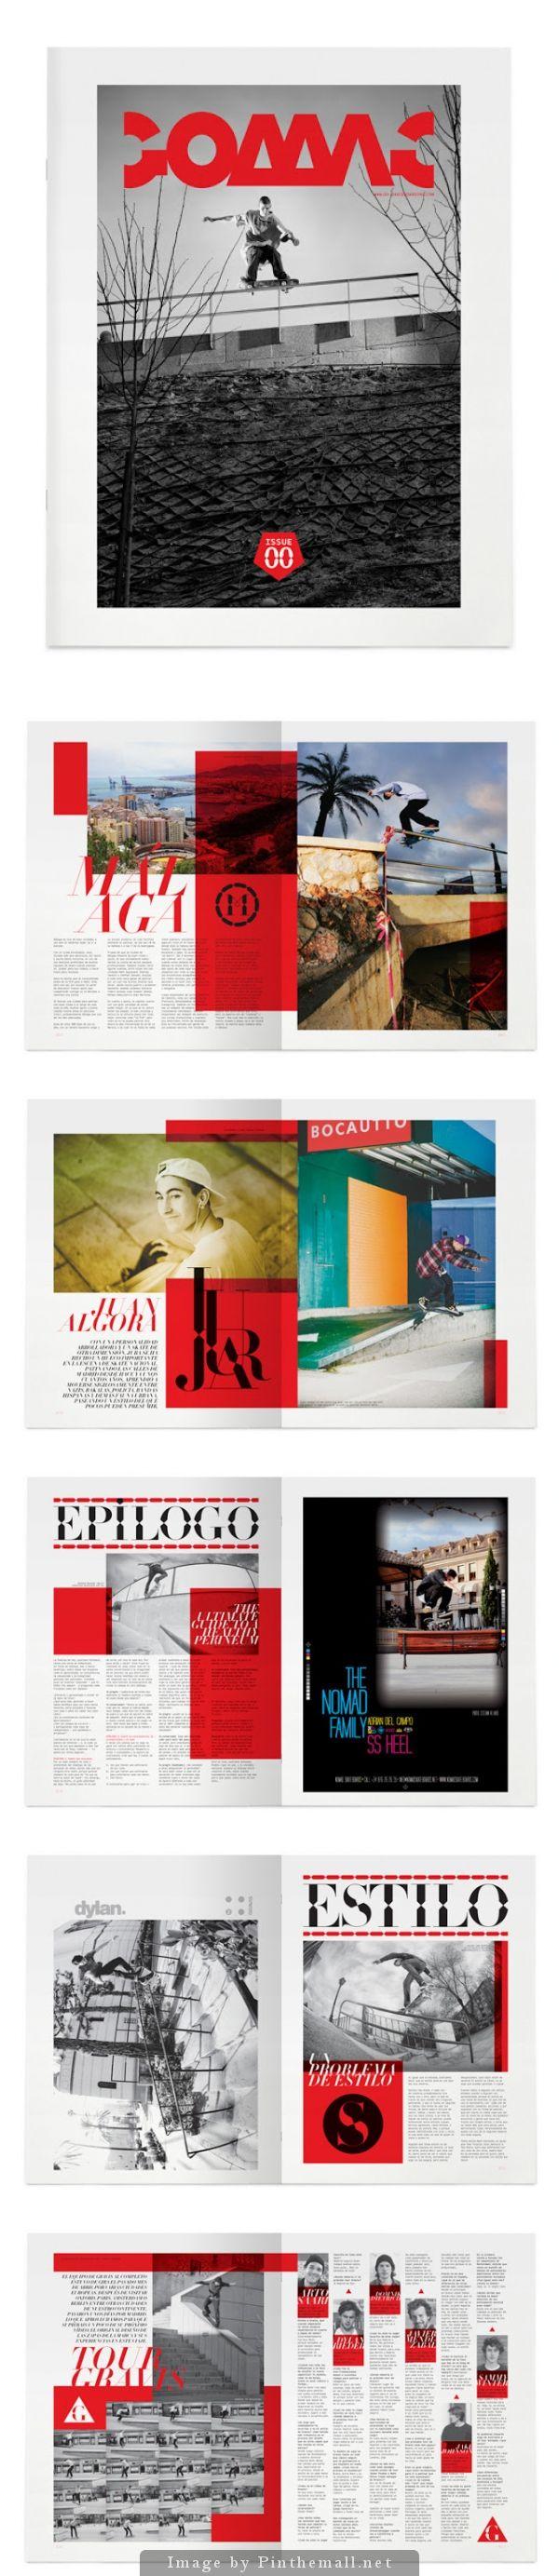 Go Skateboarding Magazine by Luis Vicente